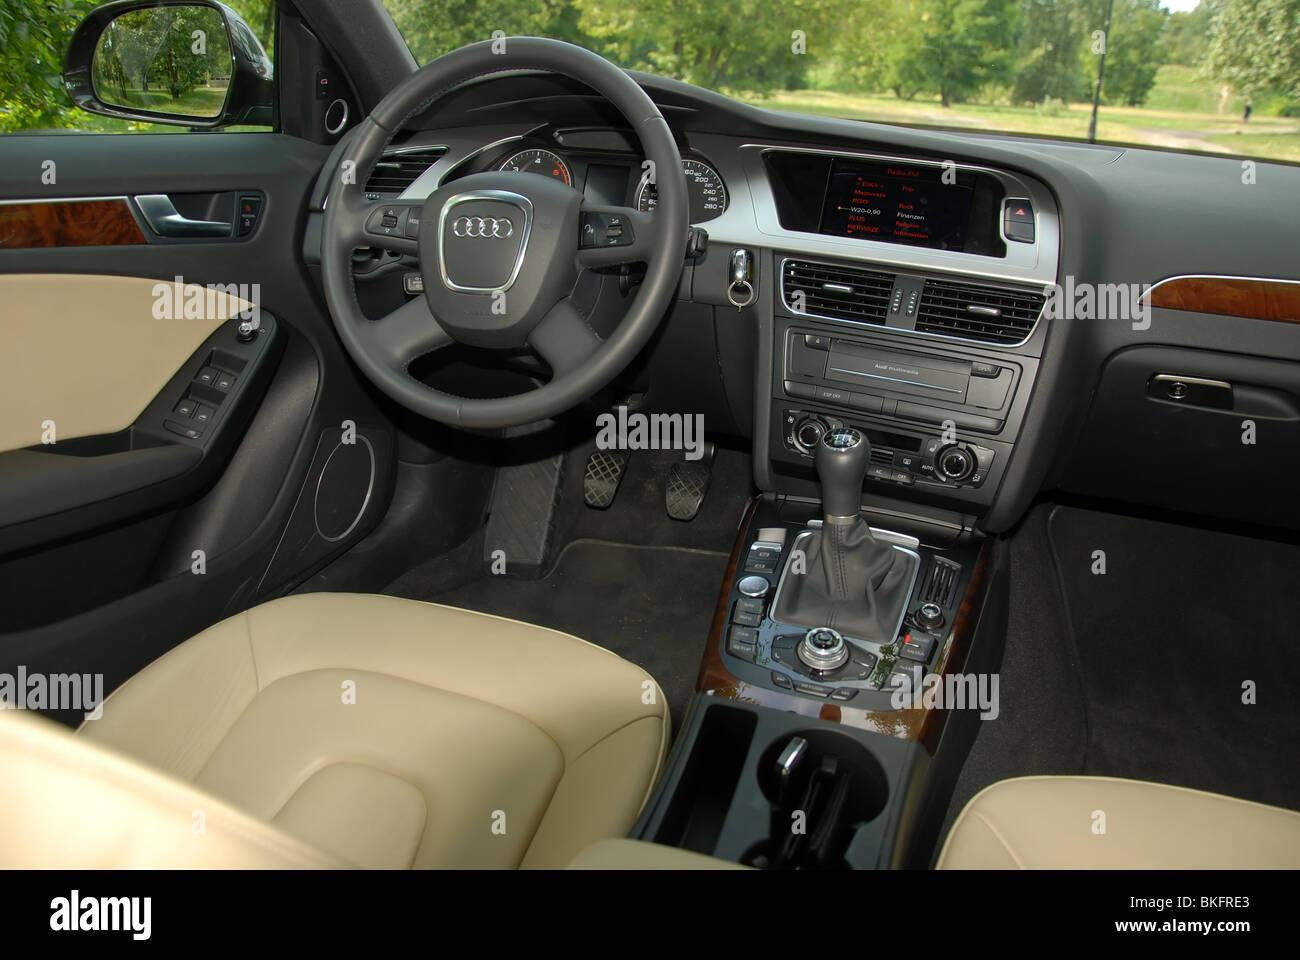 Audi A4 Allroad 2.0 TDI (Quattro) - 2009 - German premium middle ...